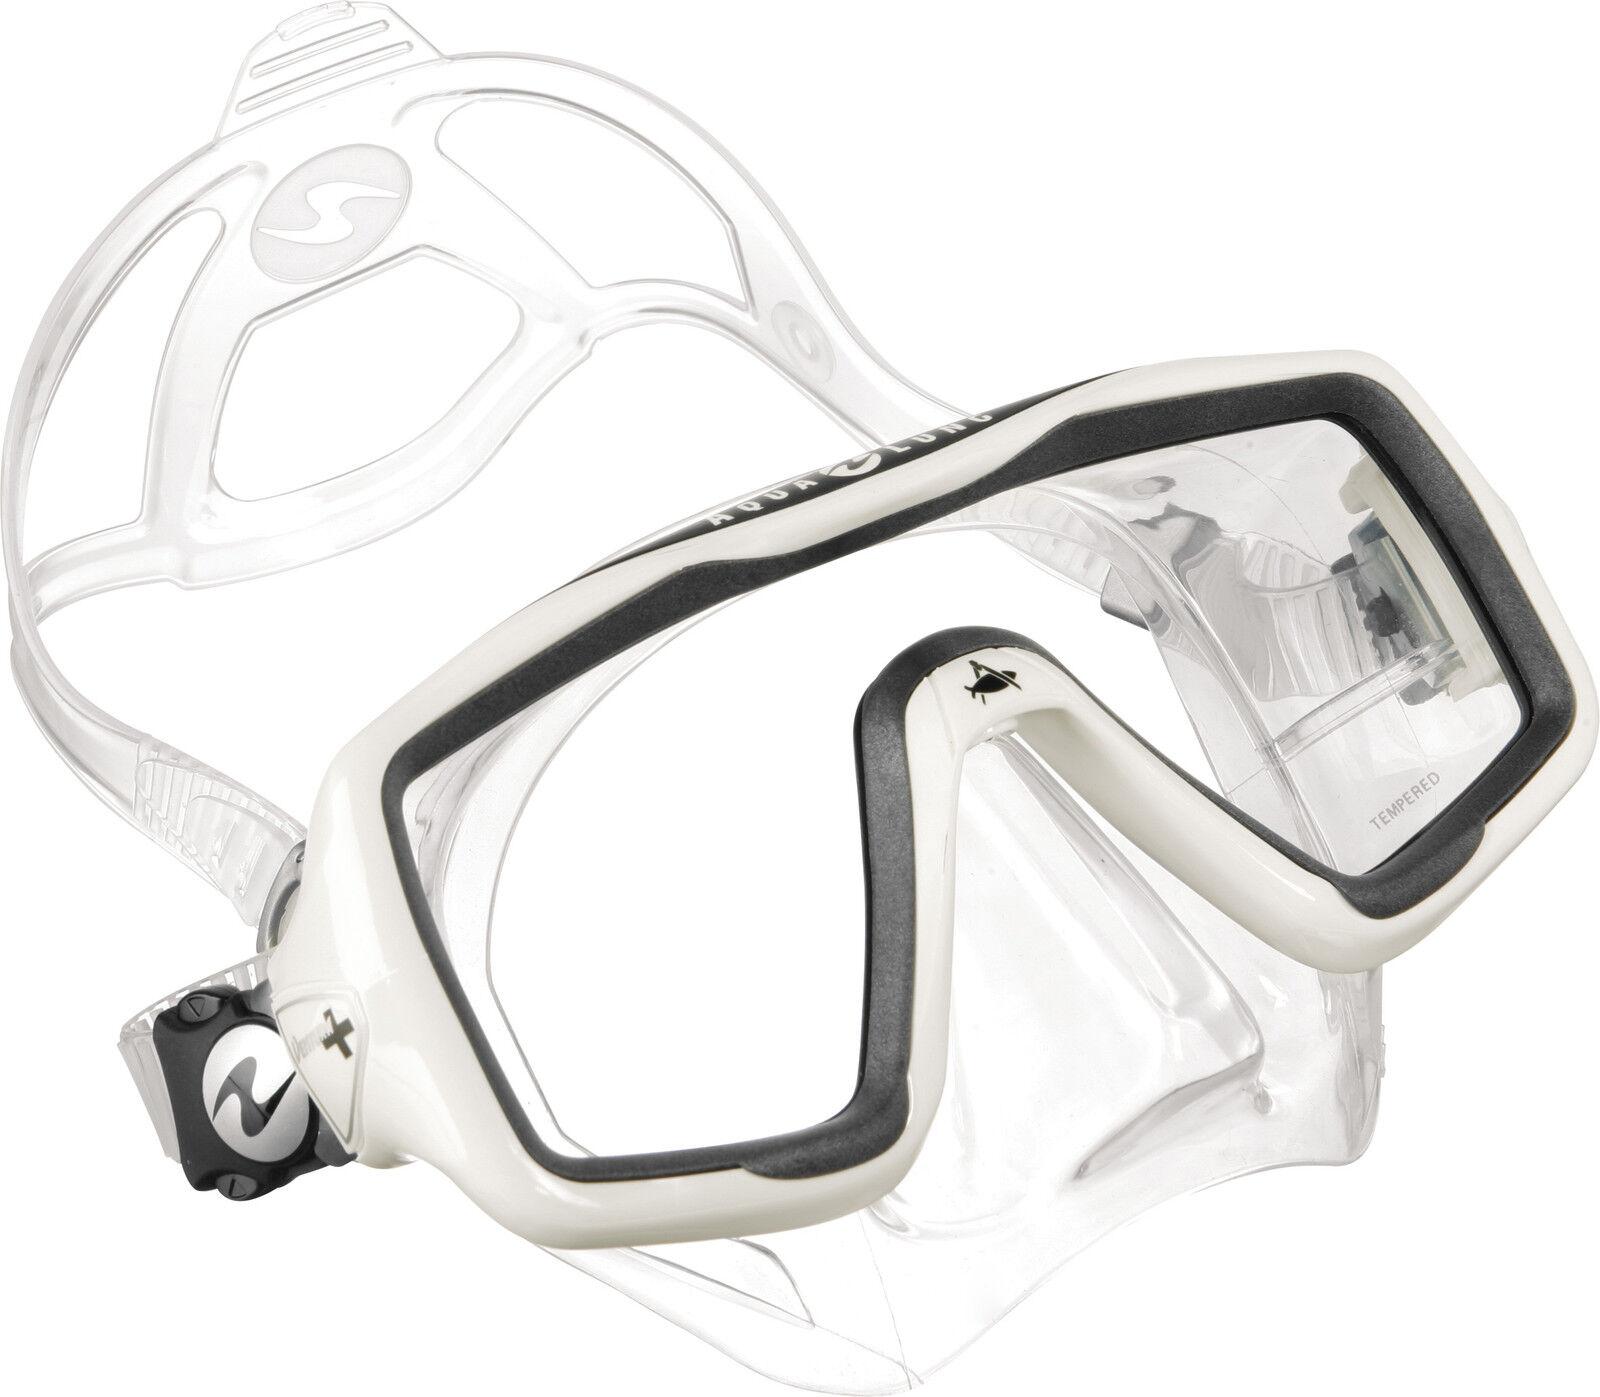 Aqualung Ventura PlusTauch Silikon Silikon Silikon  Masken Technisub die NEUE 5dff82